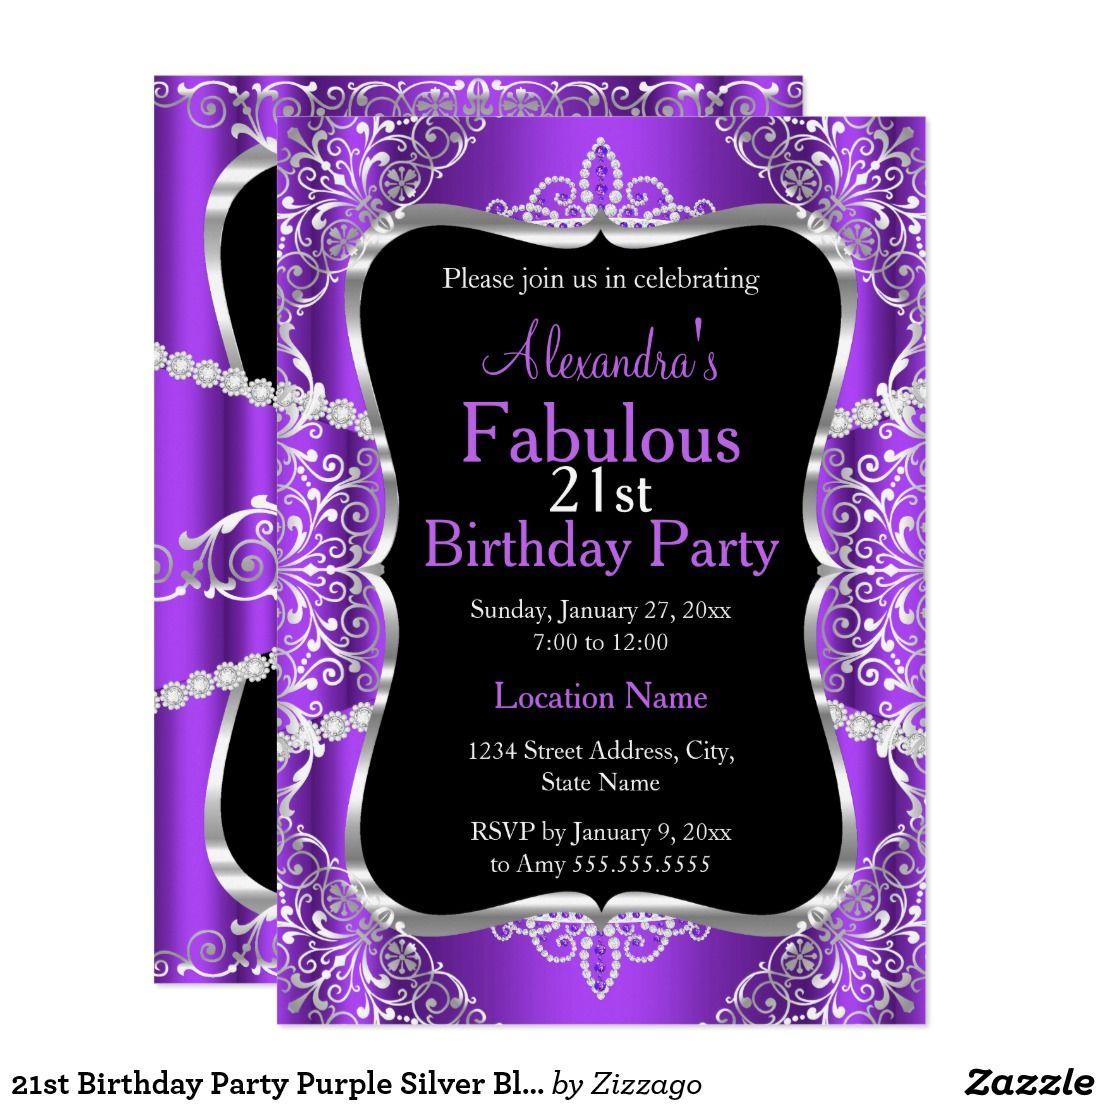 21st Birthday Party Purple Silver Black Invitation | 21st birthday ...